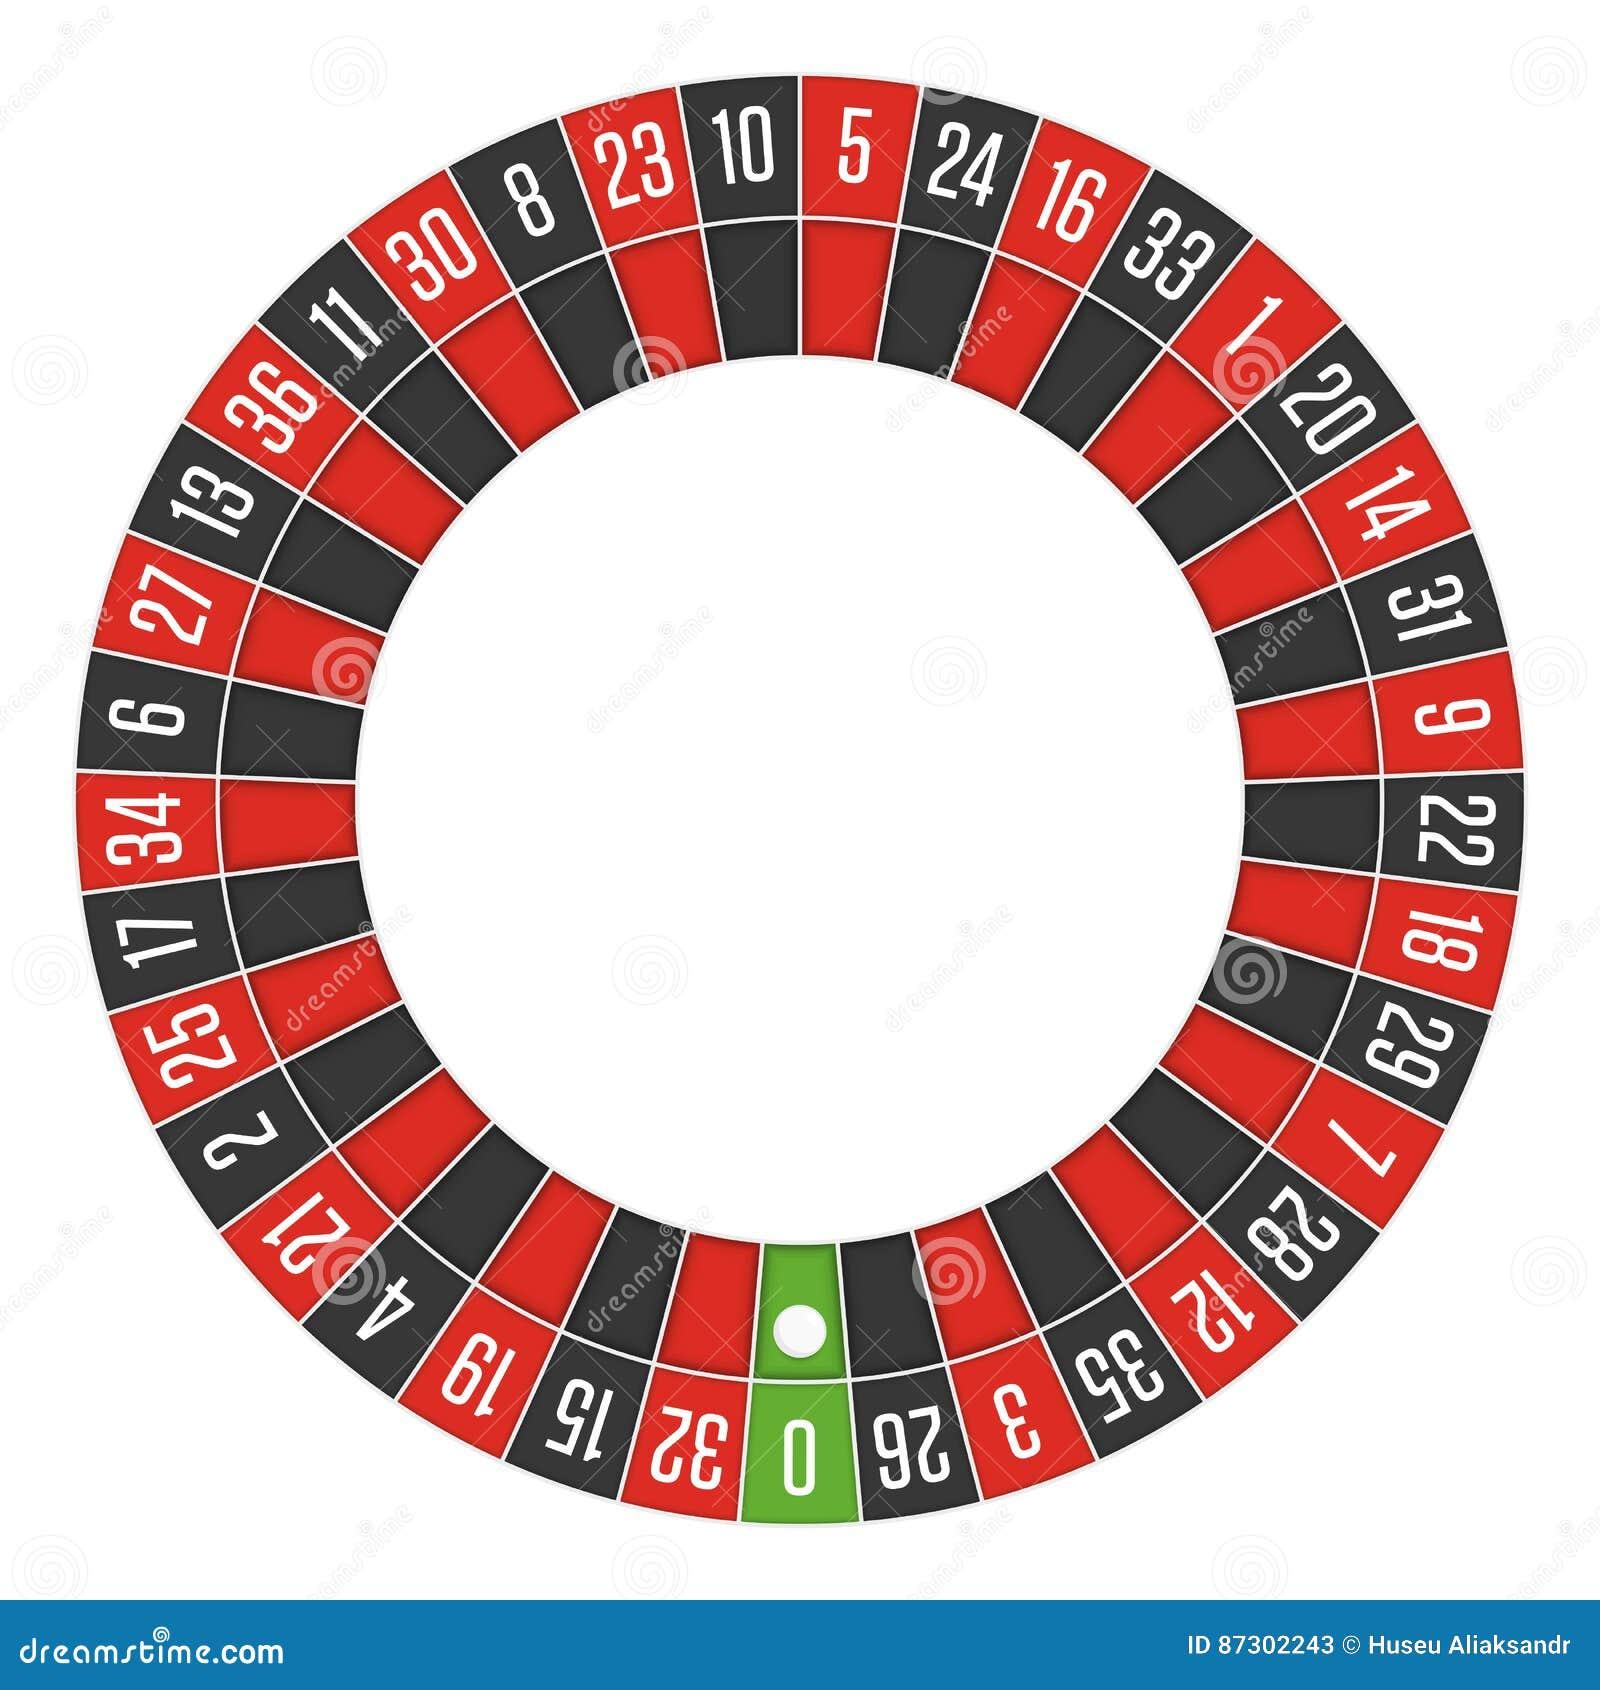 Juegos BlackLotuscasino com ruleta europea-795743